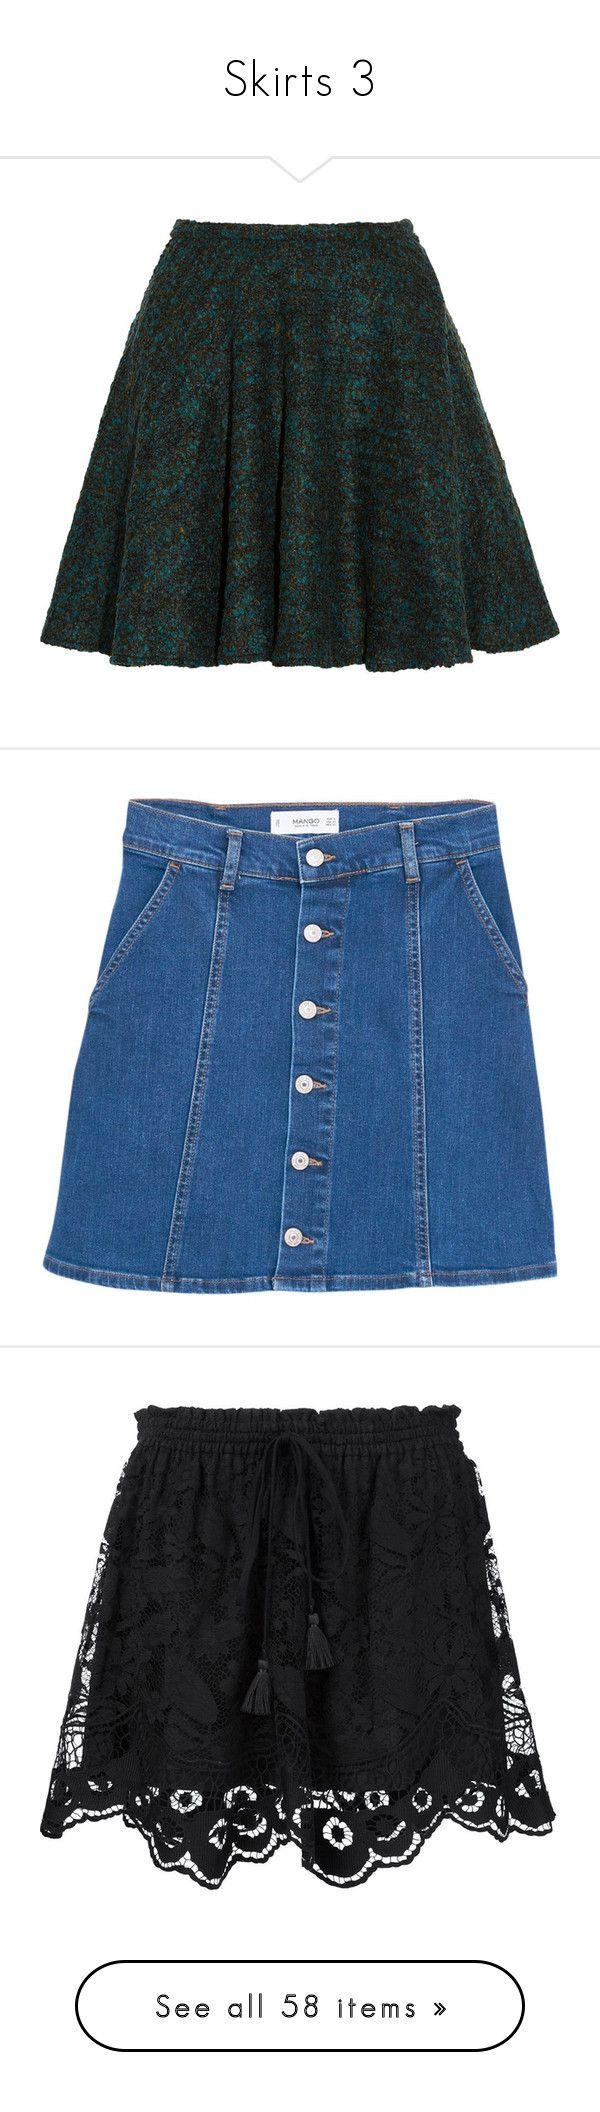 """Skirts 3"" by sinyukovayulya ❤ liked on Polyvore featuring skirts, mini skirts, bottoms, saias, faldas, kenzo, green mini skirt, flare skirts, green skirt and flared skirt"